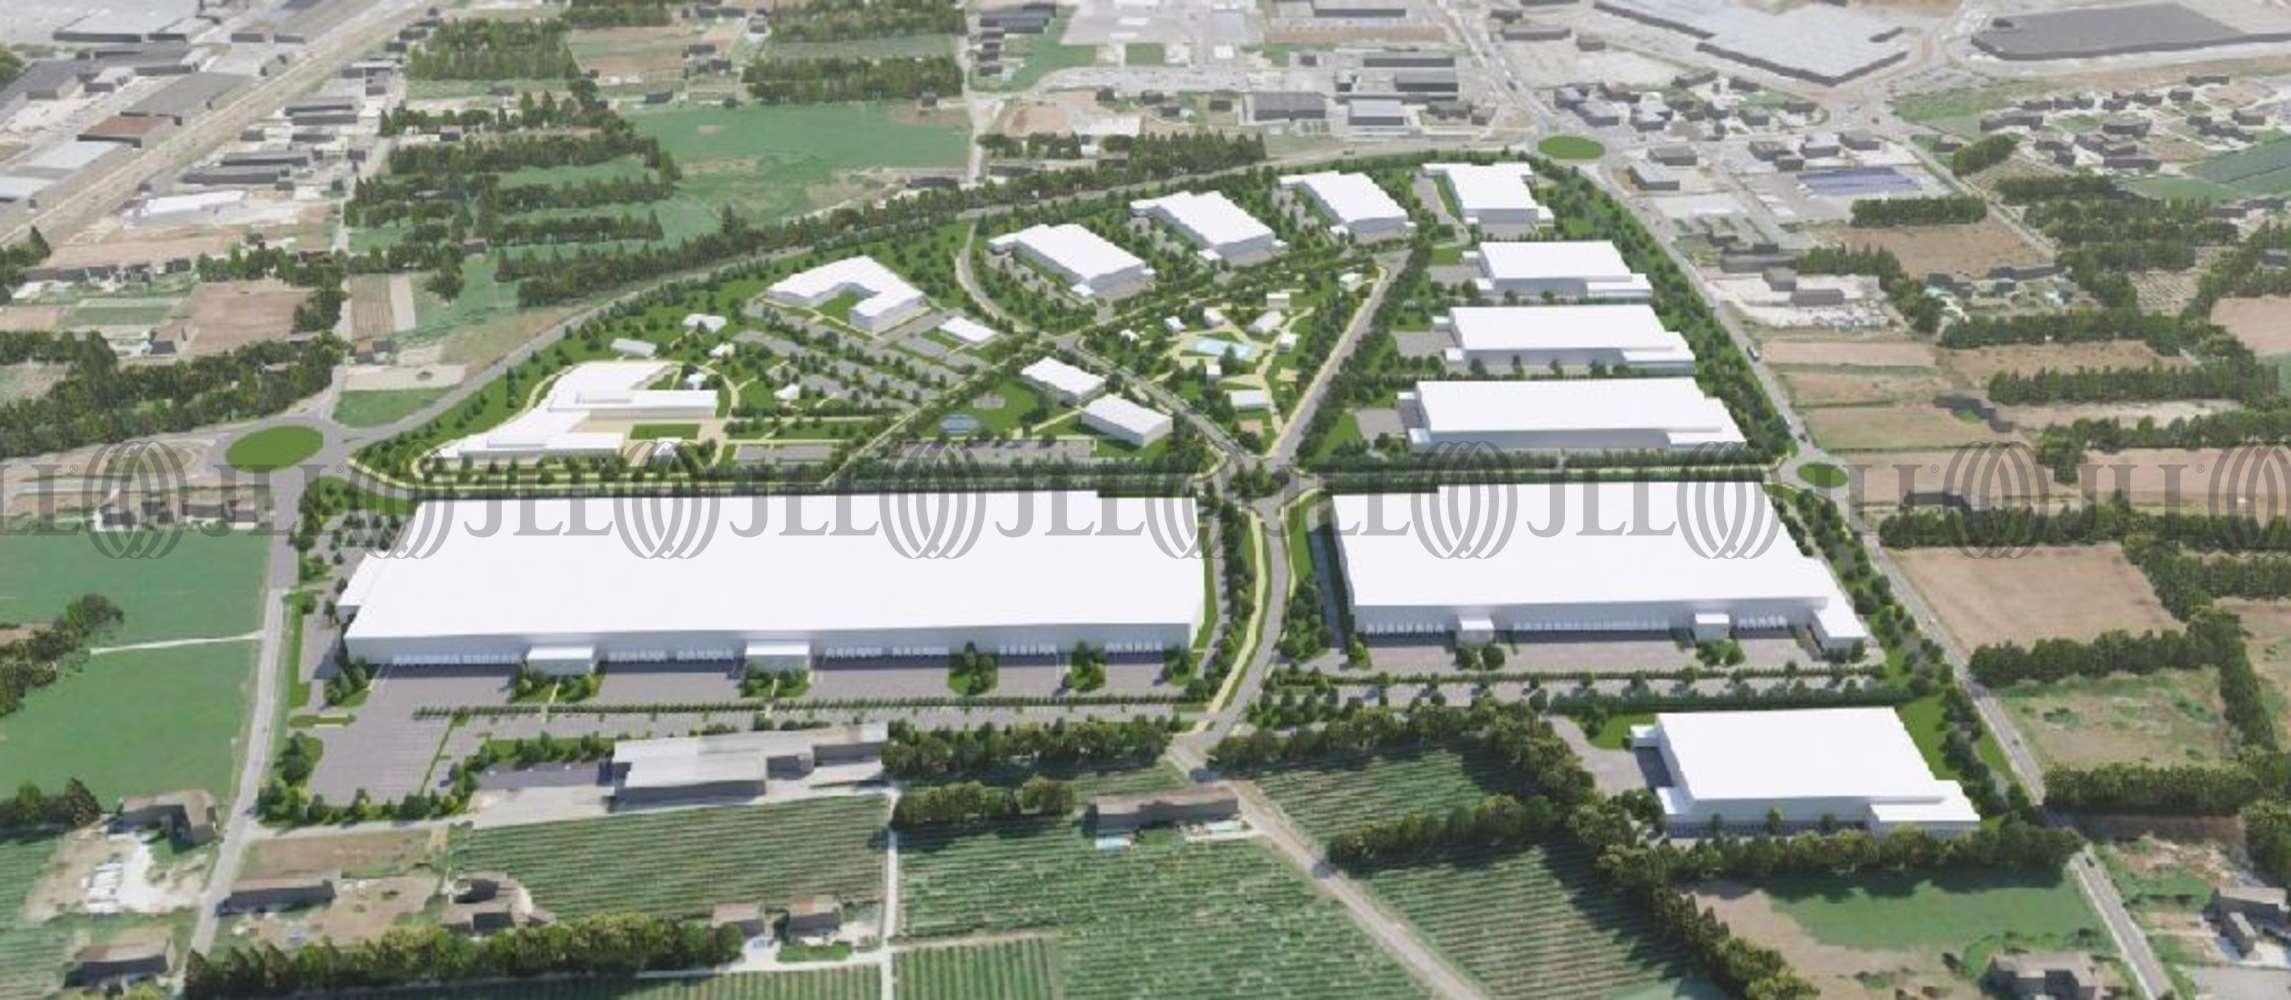 Activités/entrepôt Cavaillon, 84300